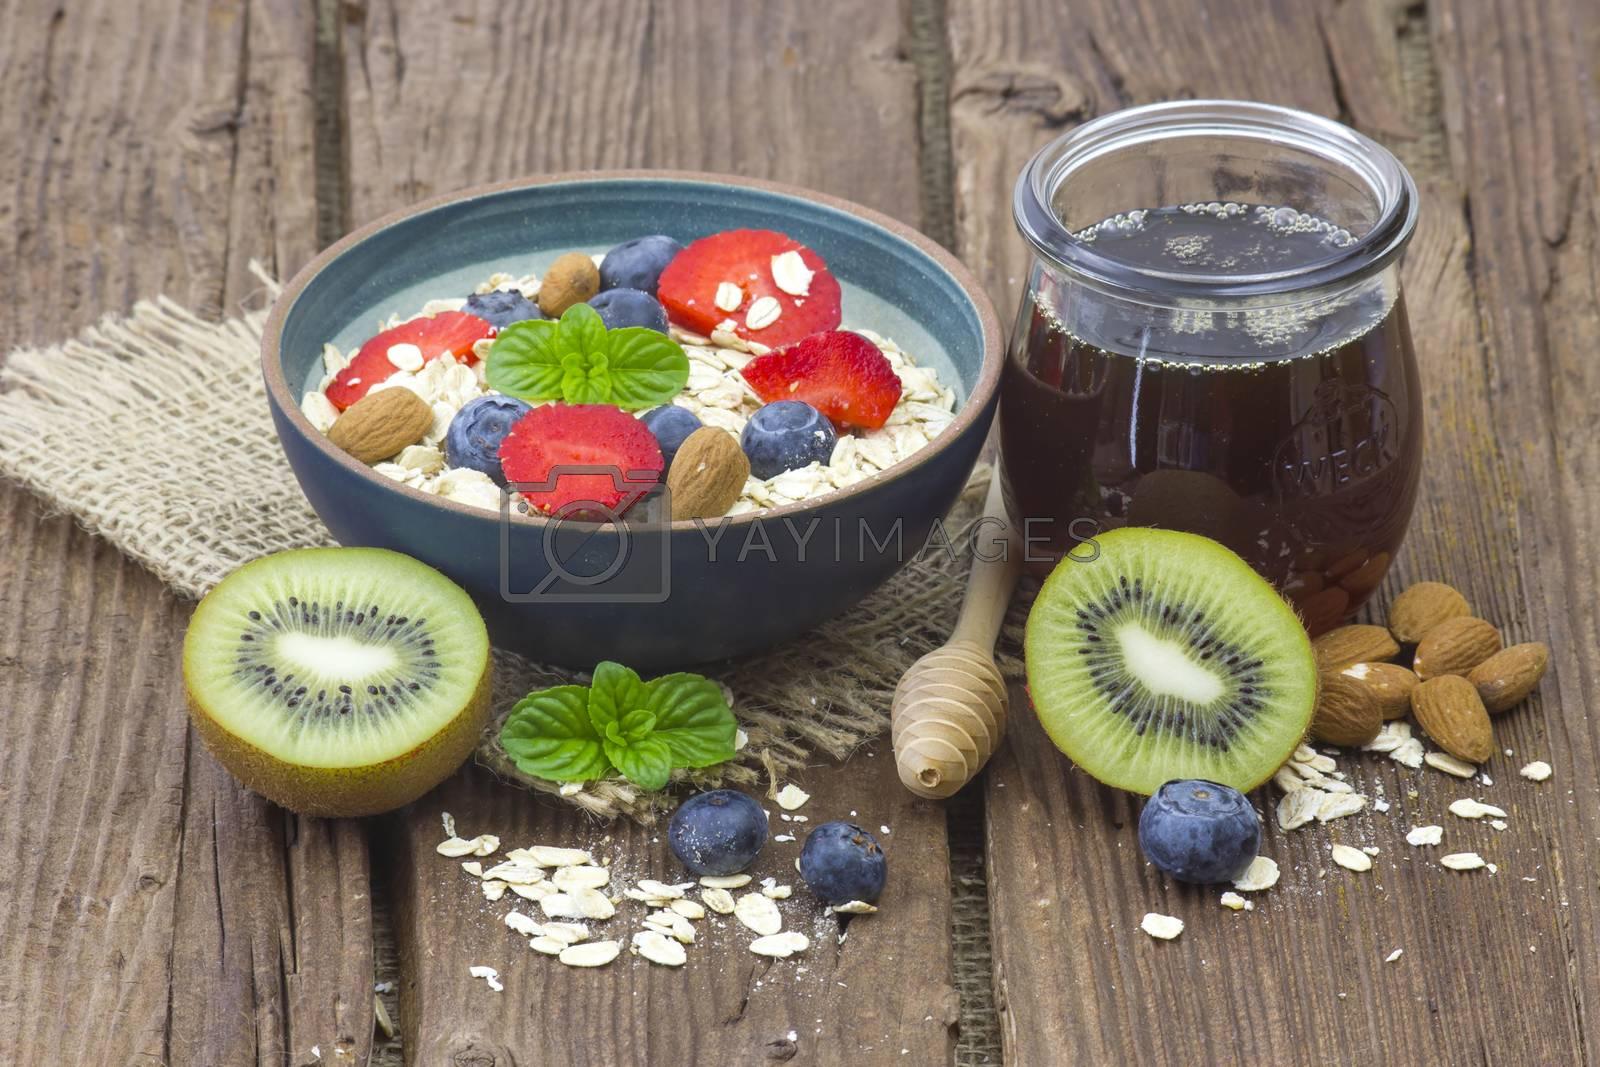 Royalty free image of healthy breakfast - muesli with fruit, yogurt and honey by miradrozdowski